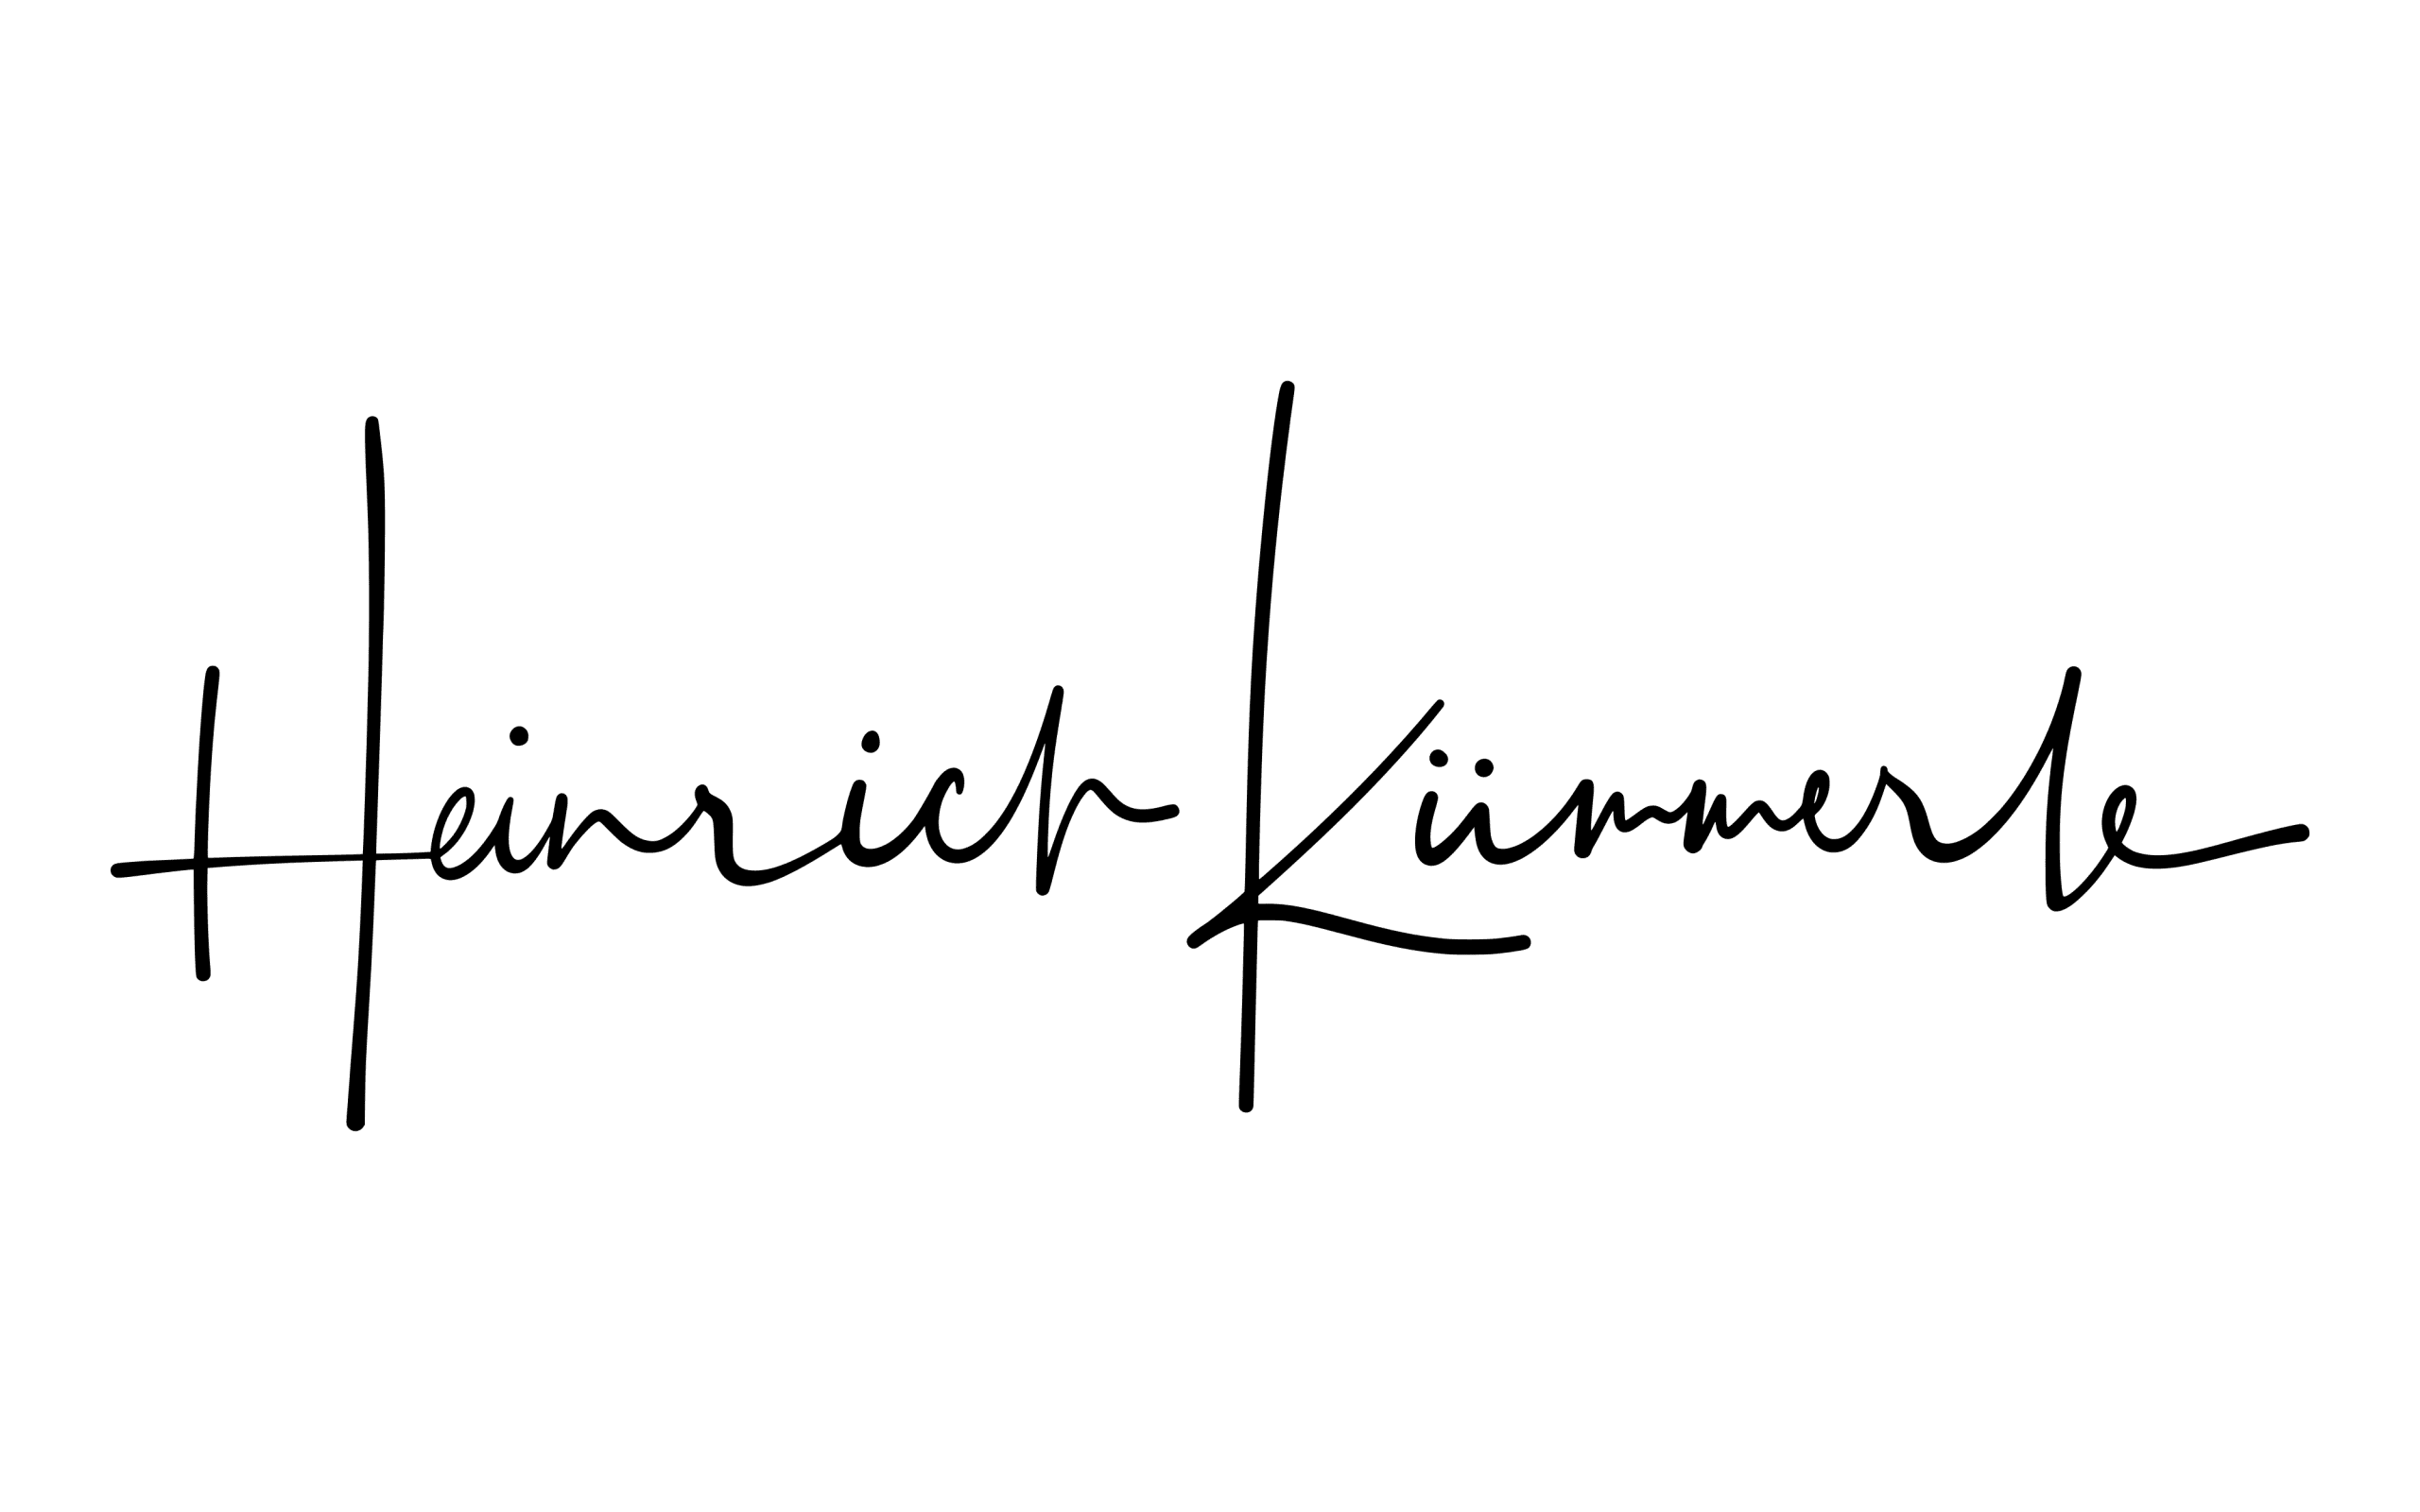 Heinrich Kümmerle